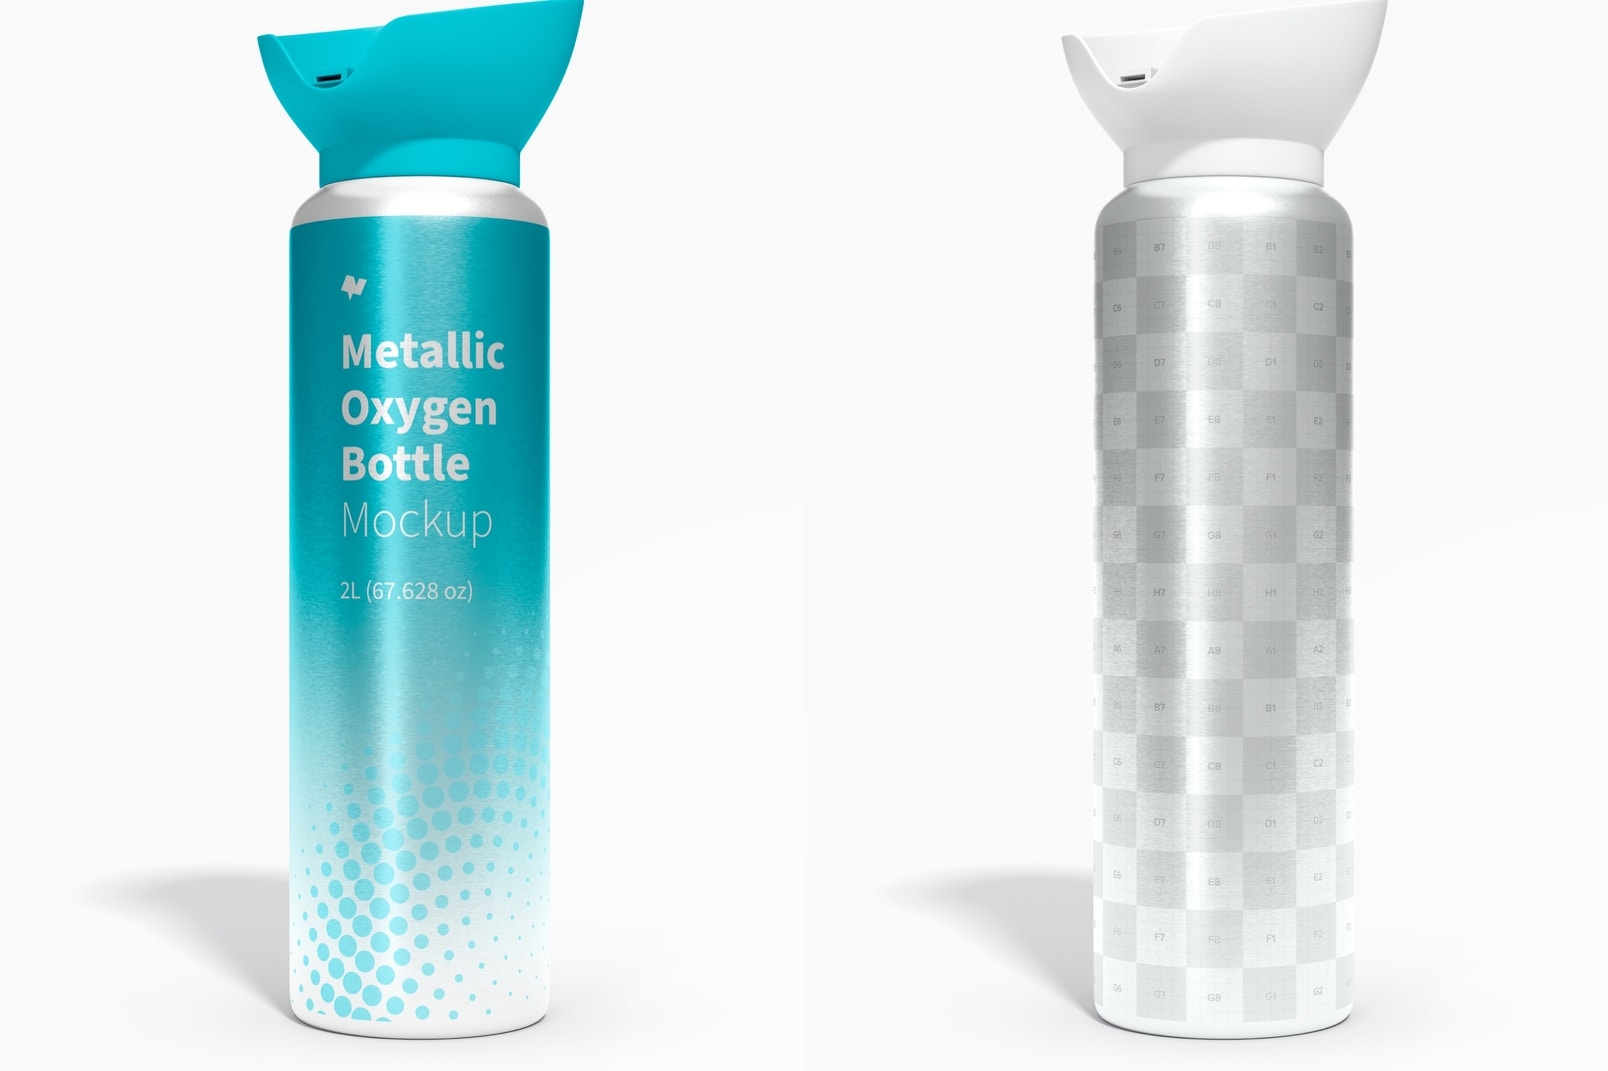 Metallic Oxygen Bottle Mockup